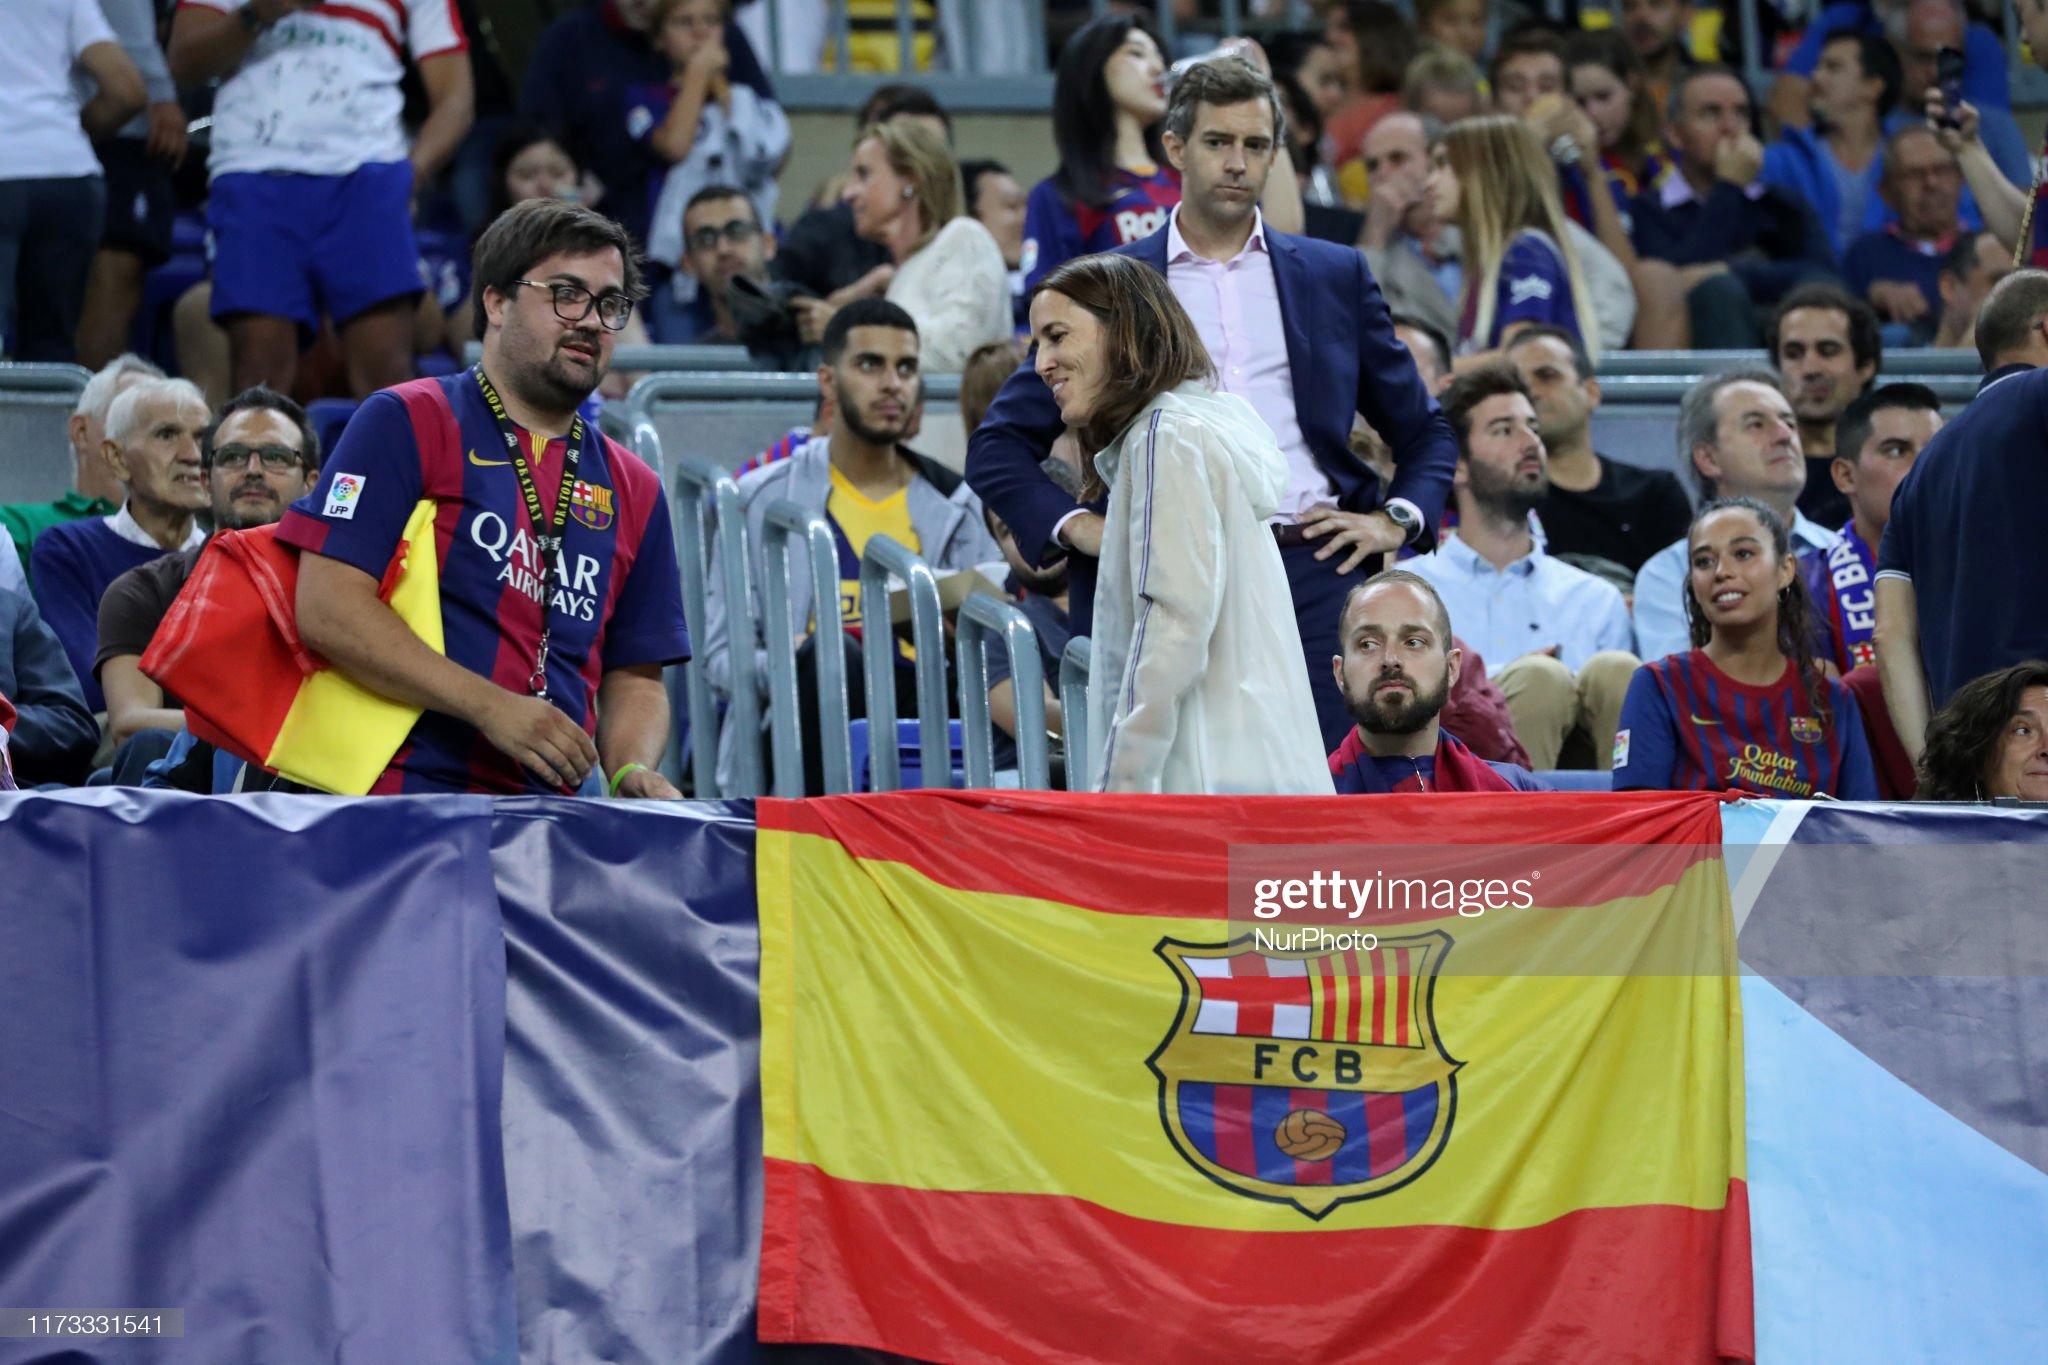 صور مباراة : برشلونة - إنتر 2-1 ( 02-10-2019 )  Supporter-during-the-match-between-fc-barcelona-between-inter-to-the-picture-id1173331541?s=2048x2048